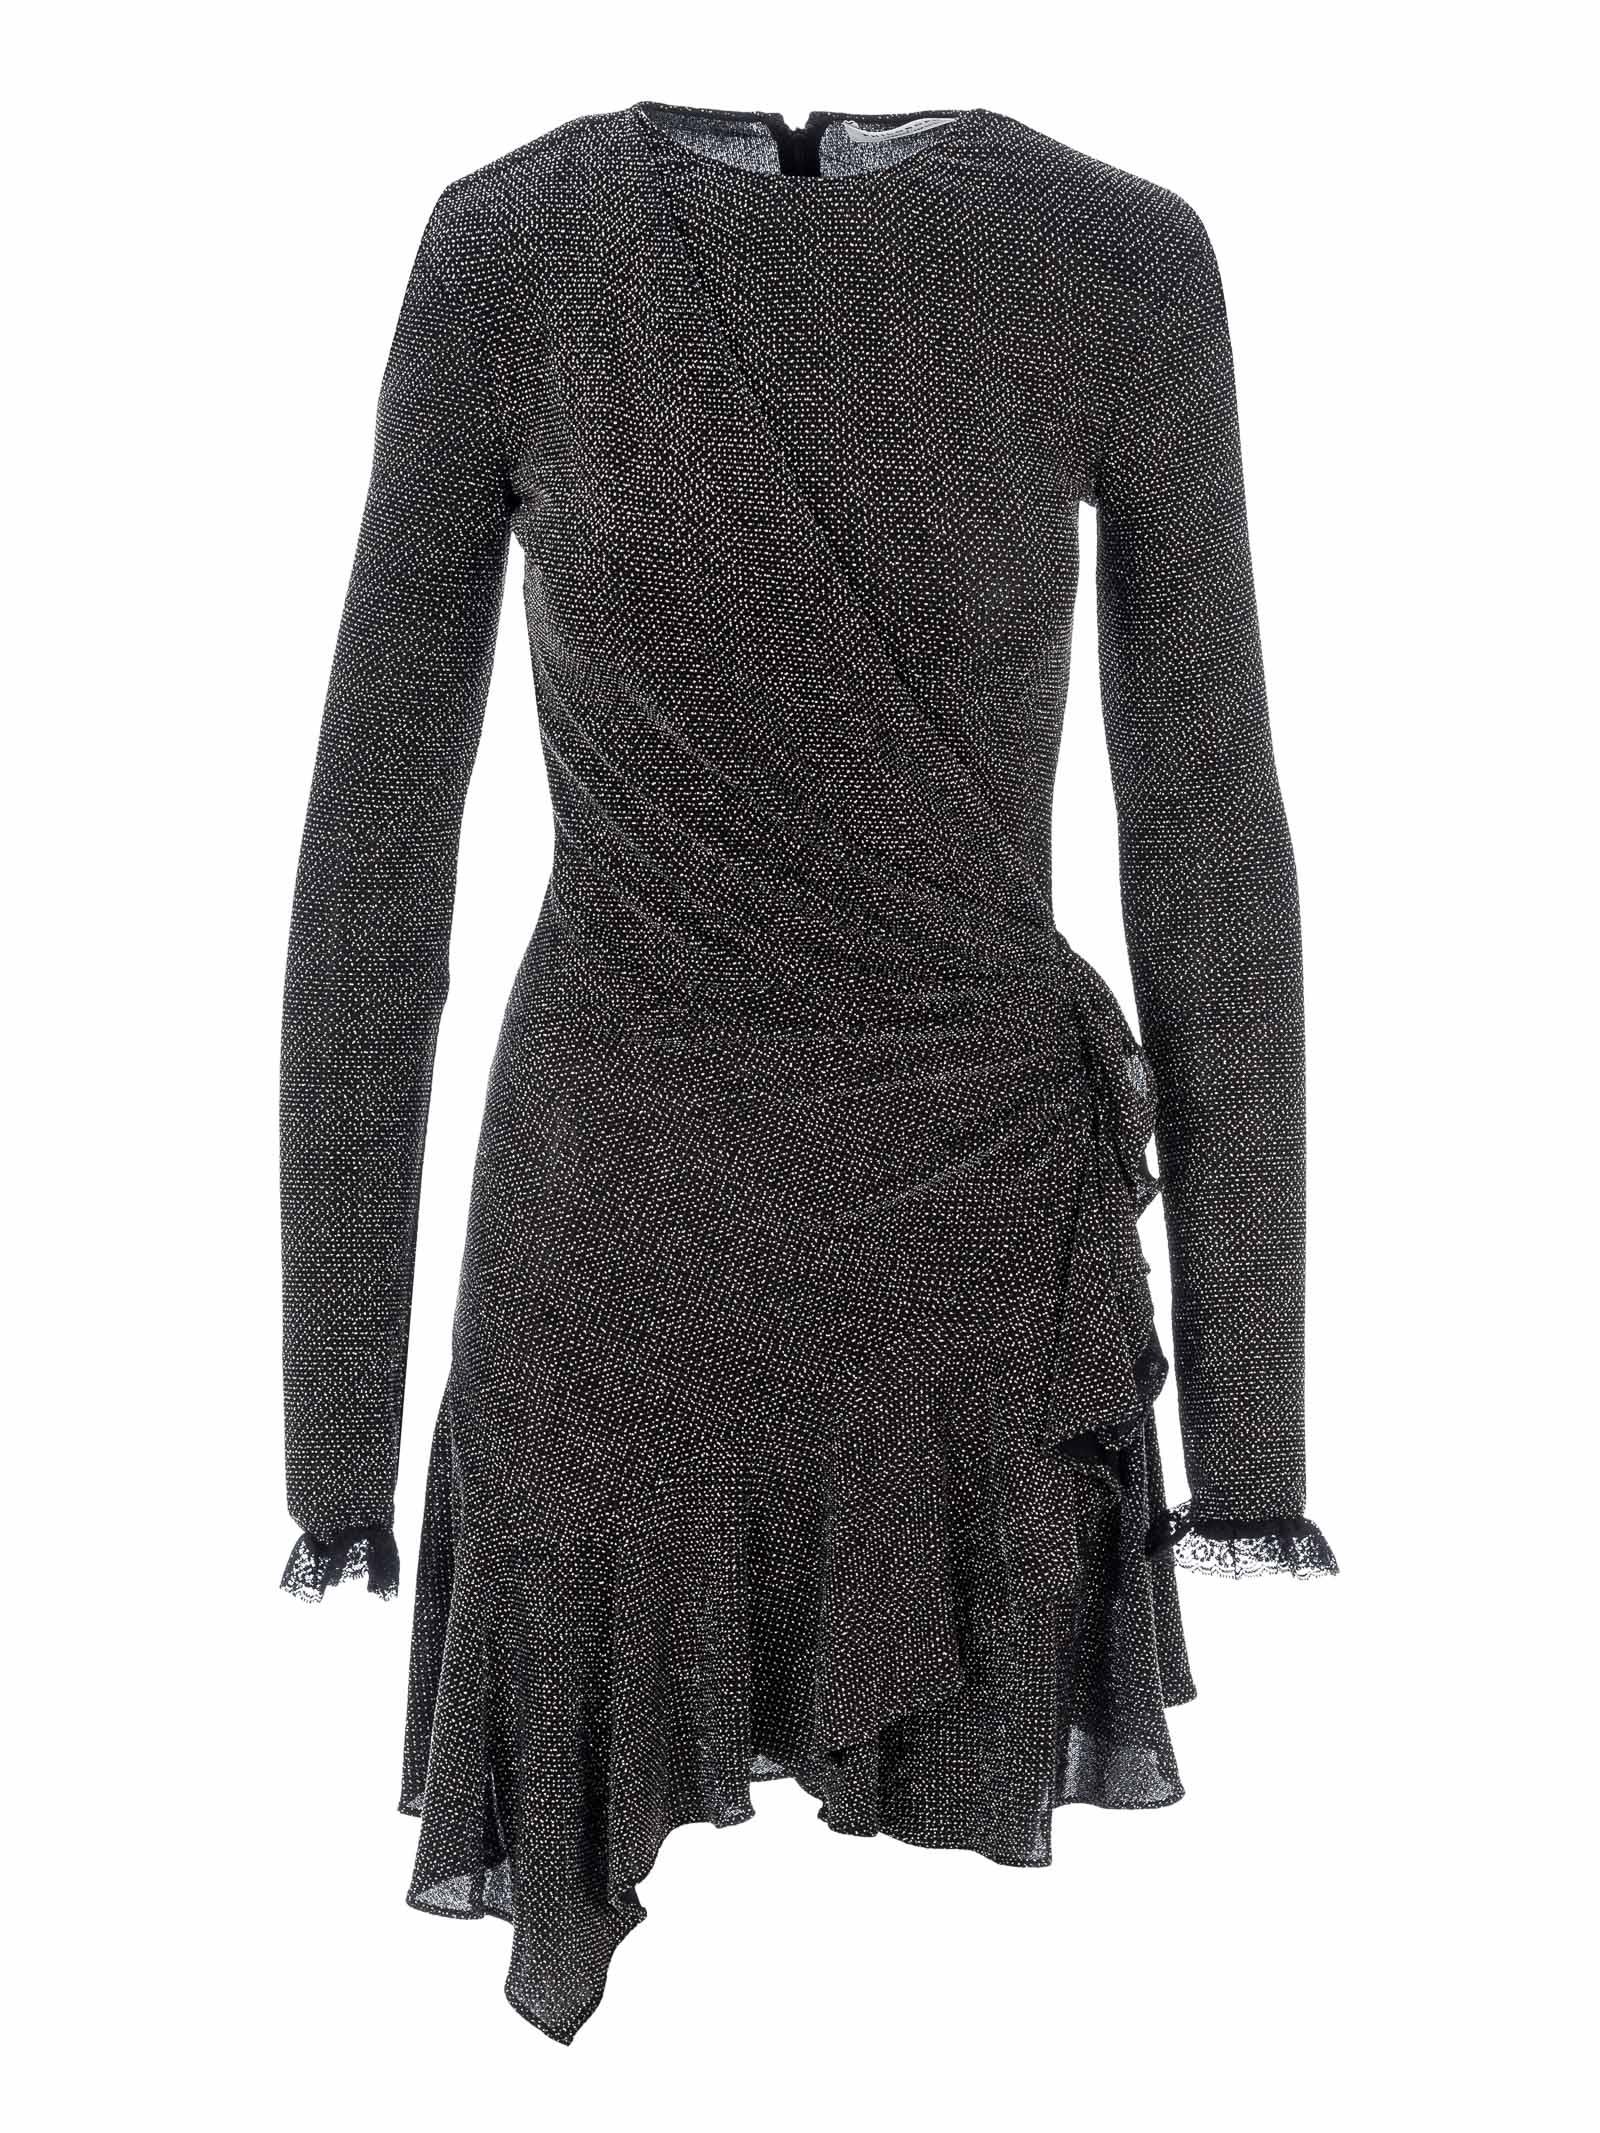 Buy Philosophy Stud Details Mini Dress online, shop Philosophy di Lorenzo Serafini with free shipping